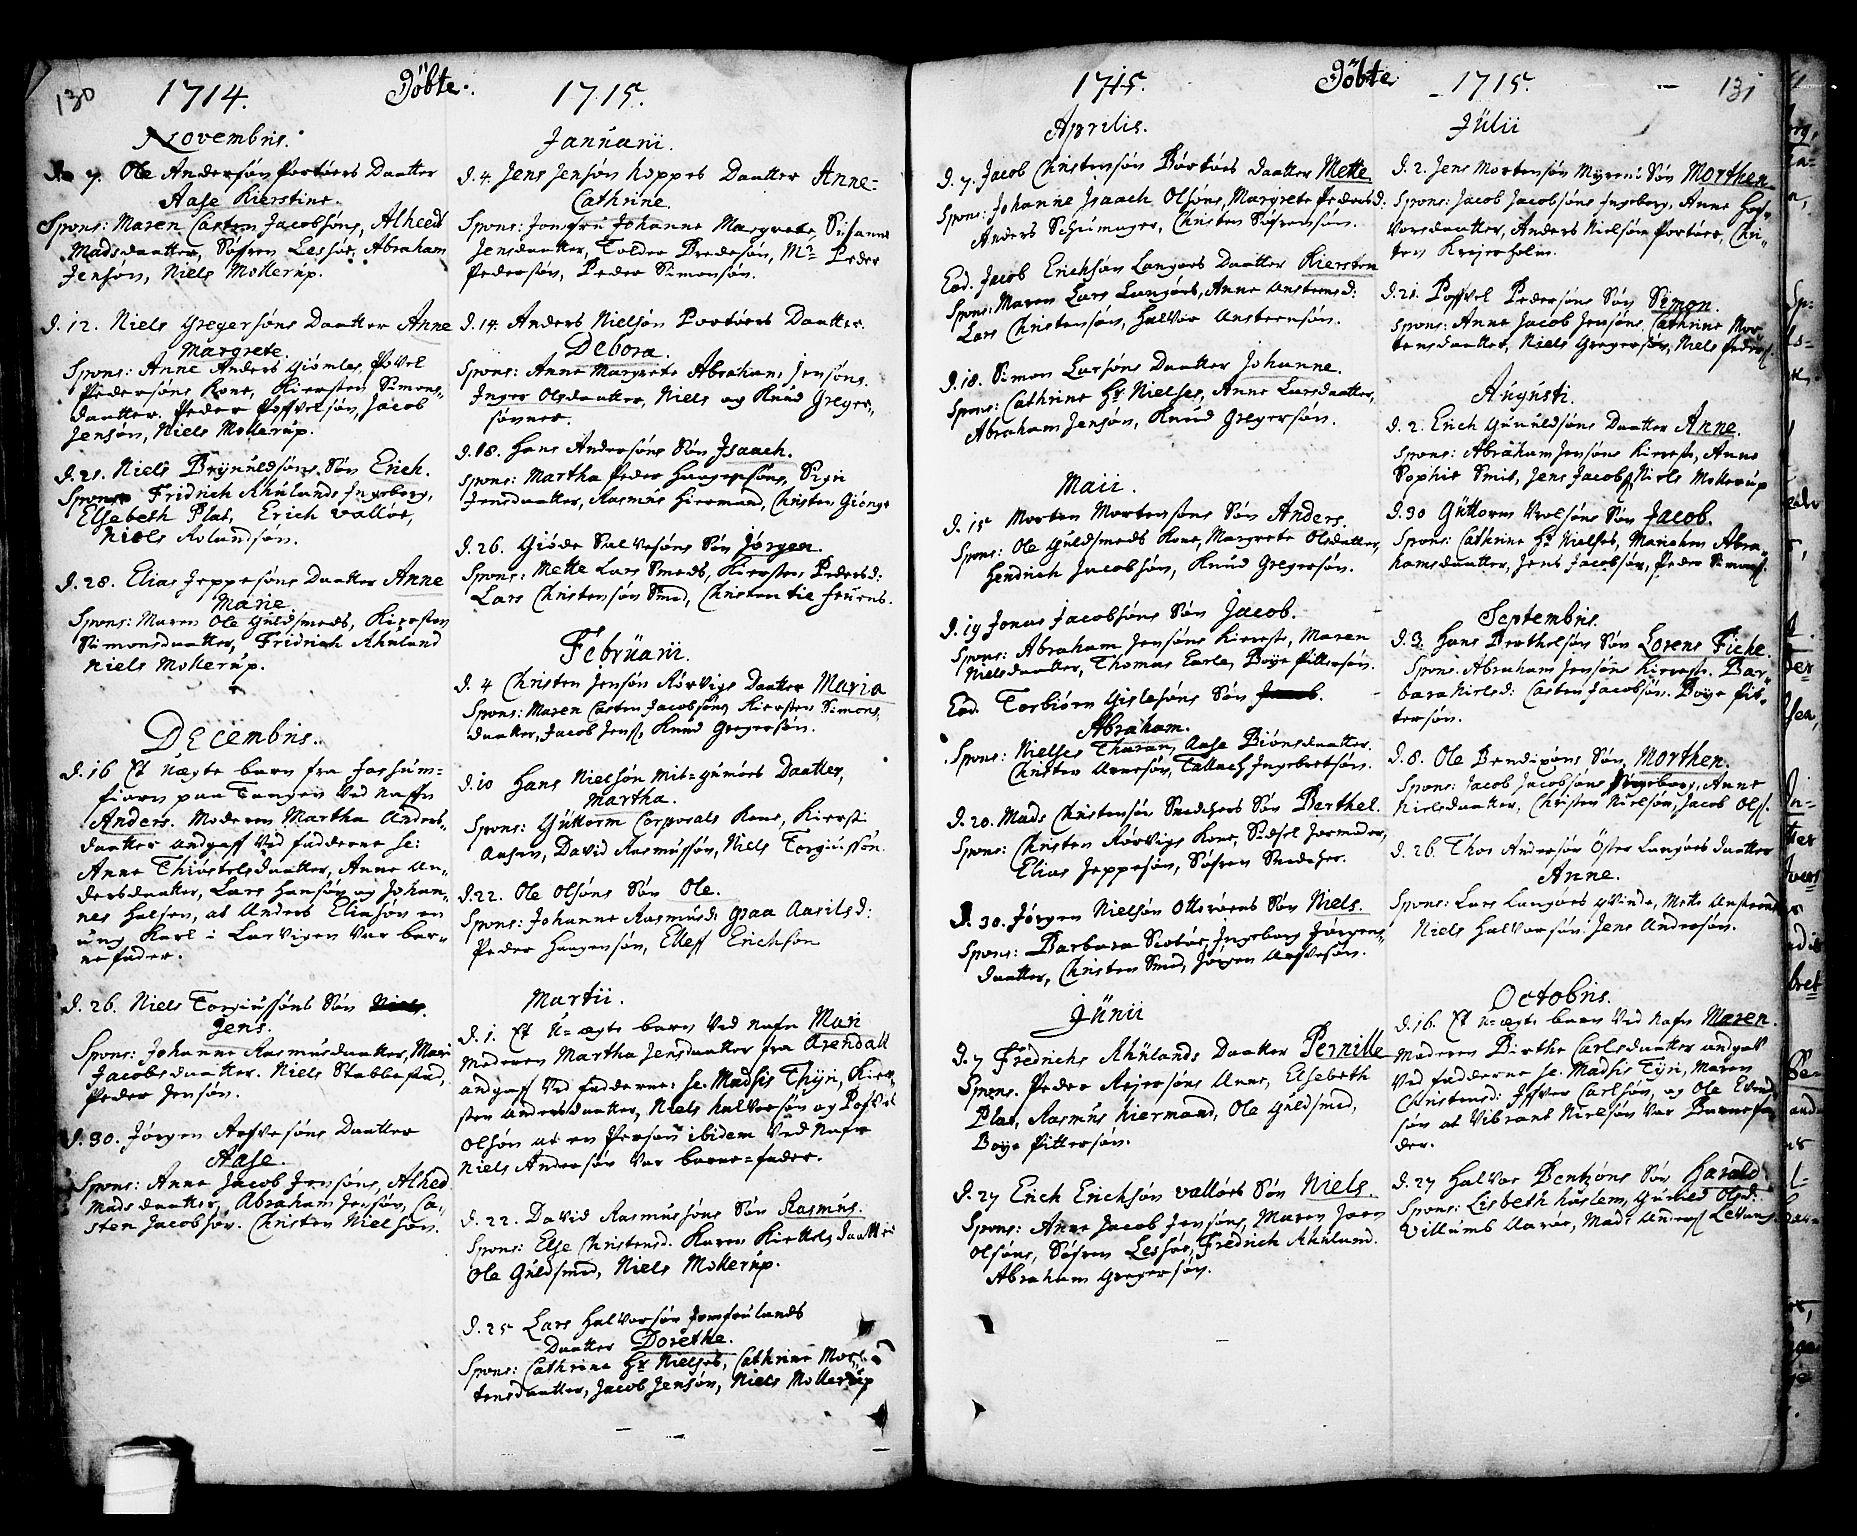 SAKO, Kragerø kirkebøker, F/Fa/L0001: Ministerialbok nr. 1, 1702-1766, s. 130-131